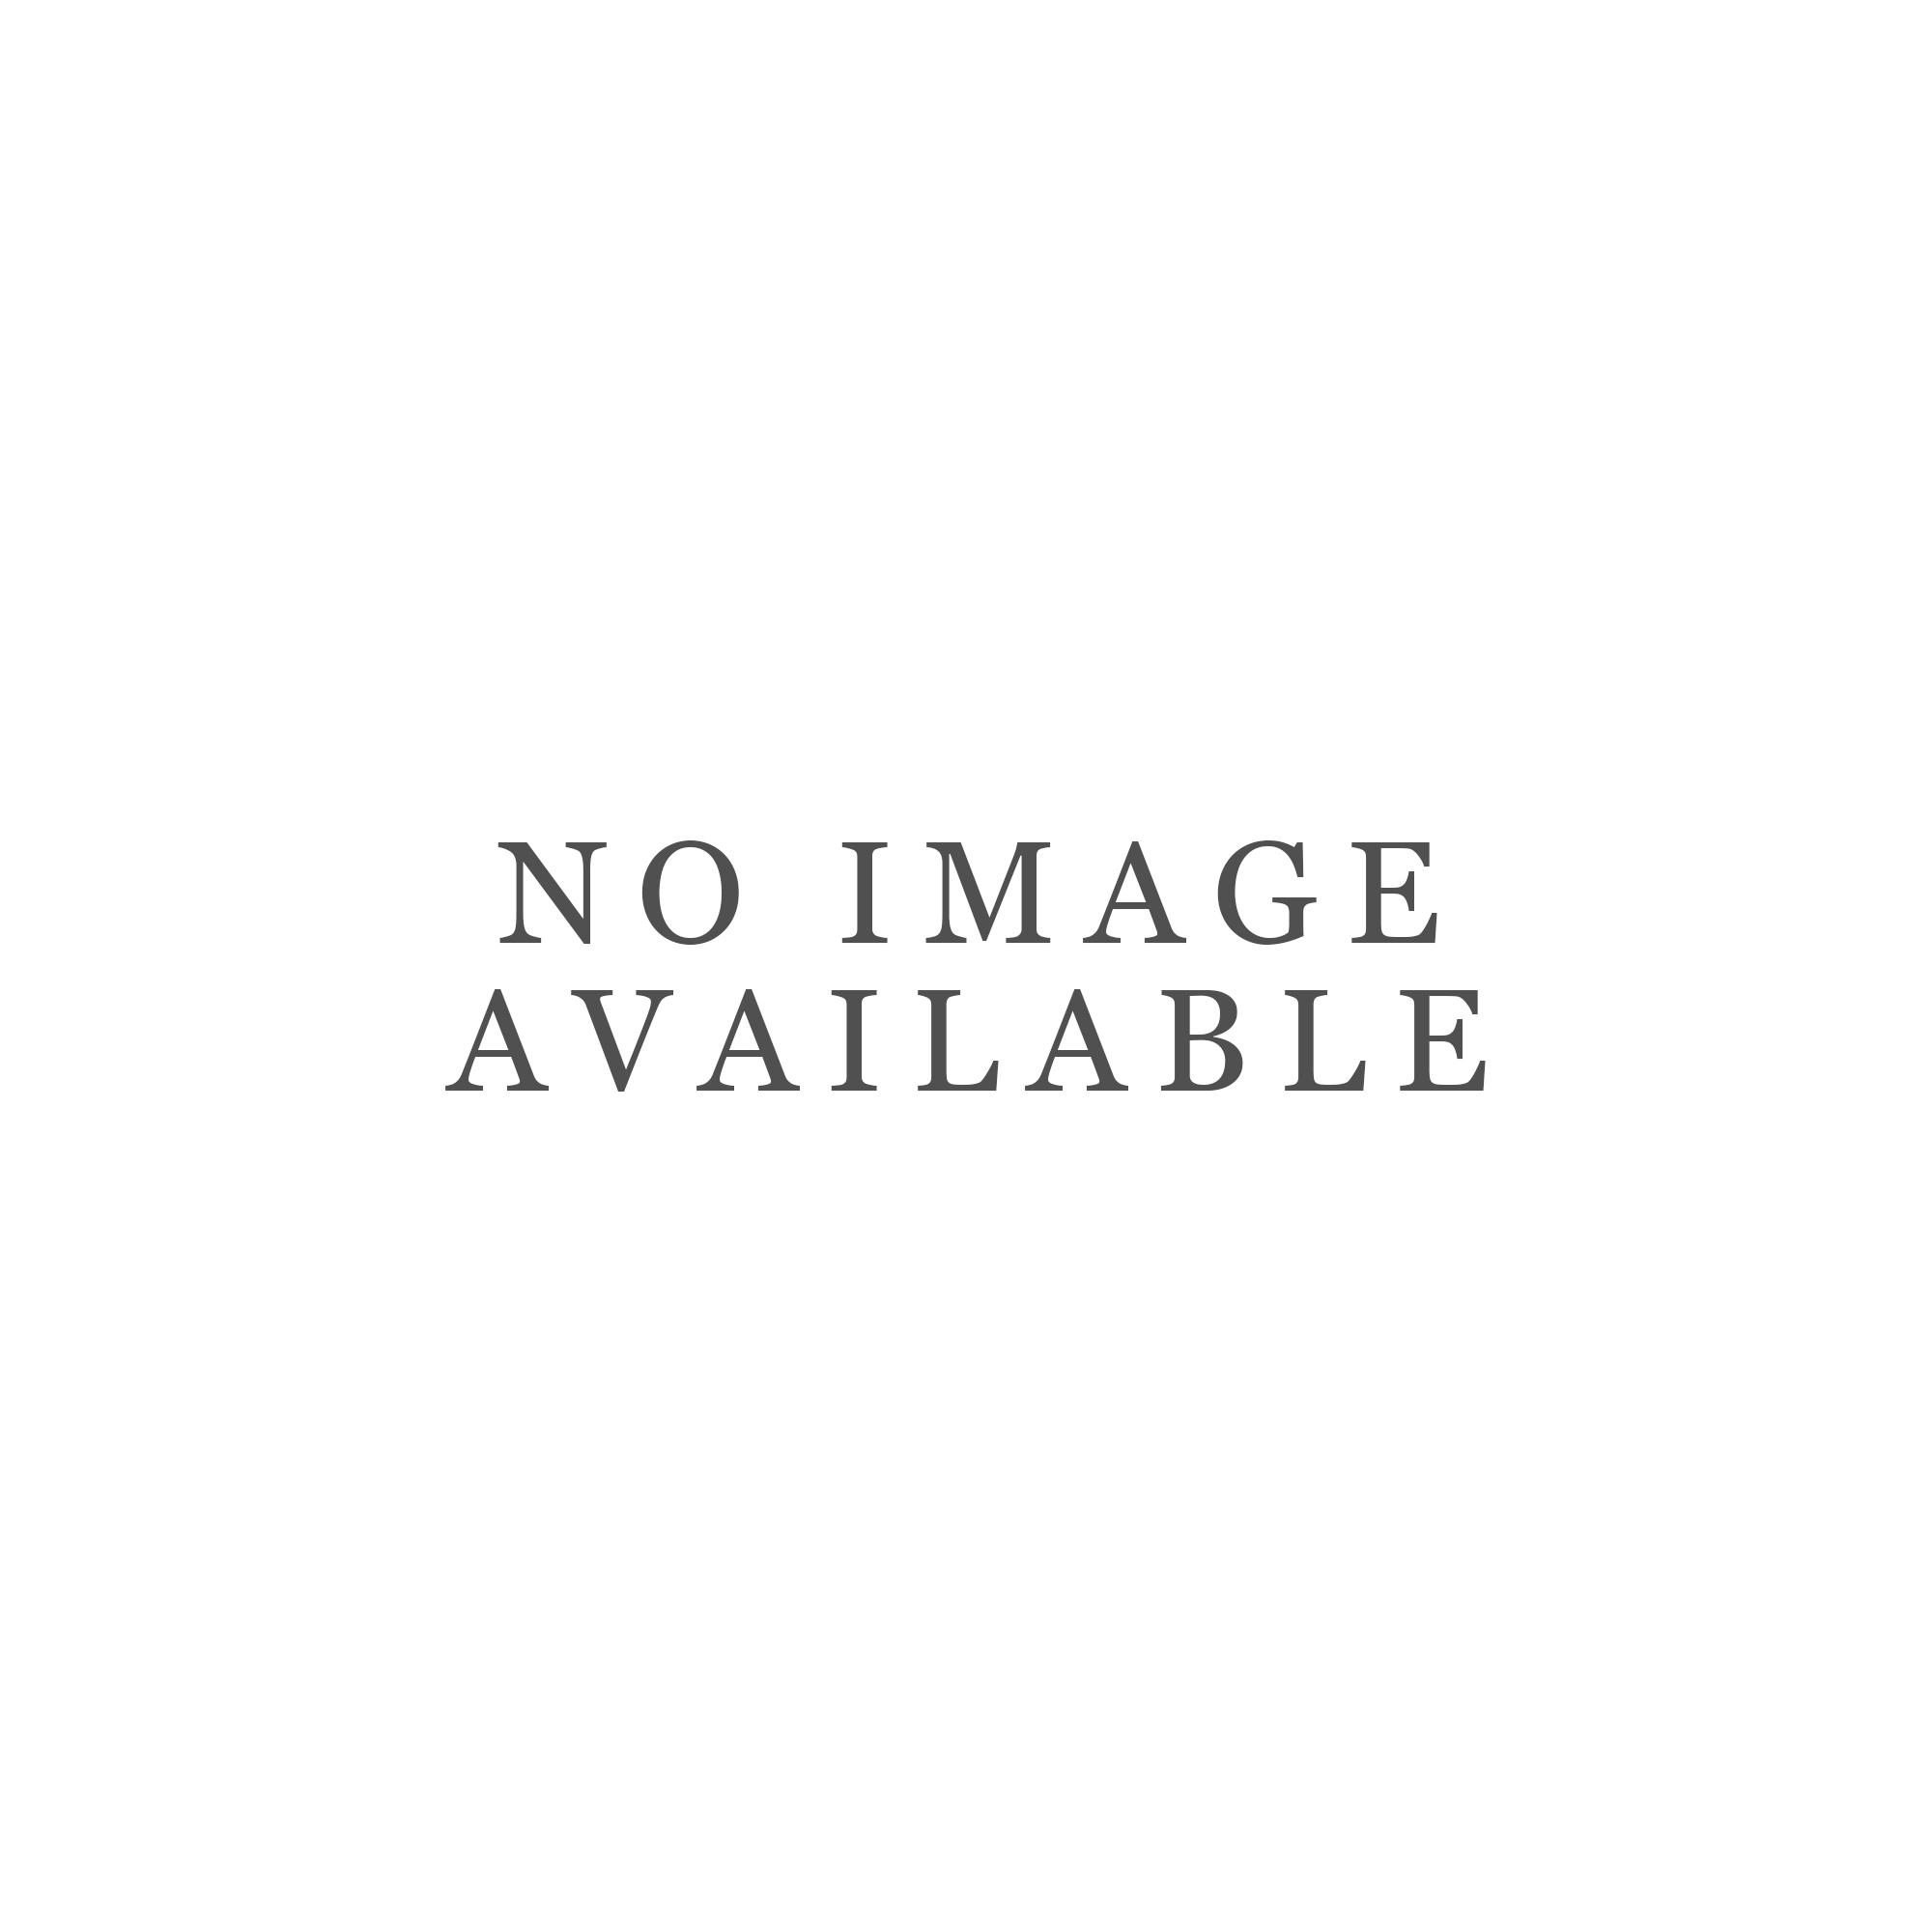 Ladies Shipton and Co Exclusive 9ct Yellow Gold Victorian Deisght 16p 7 Stone Diamond Ring RYX106DI